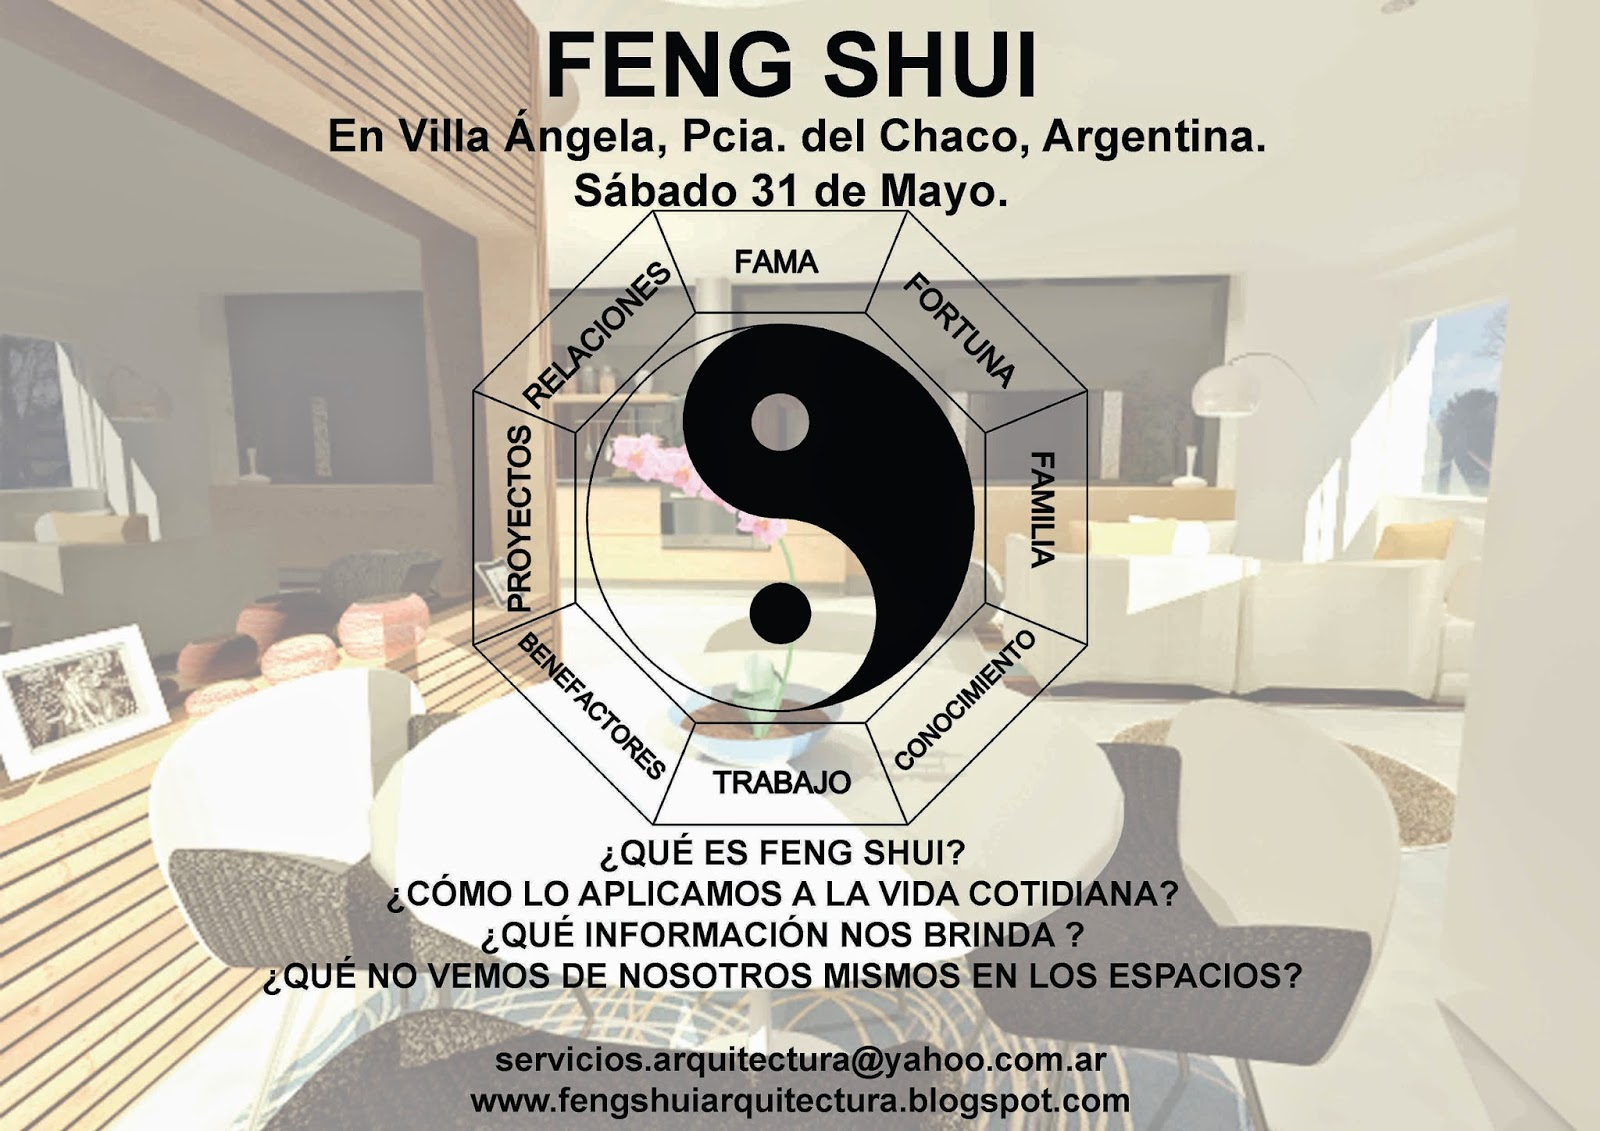 Arquitectura y feng shui feng shui en villa ngela - Arquitectura y feng shui ...